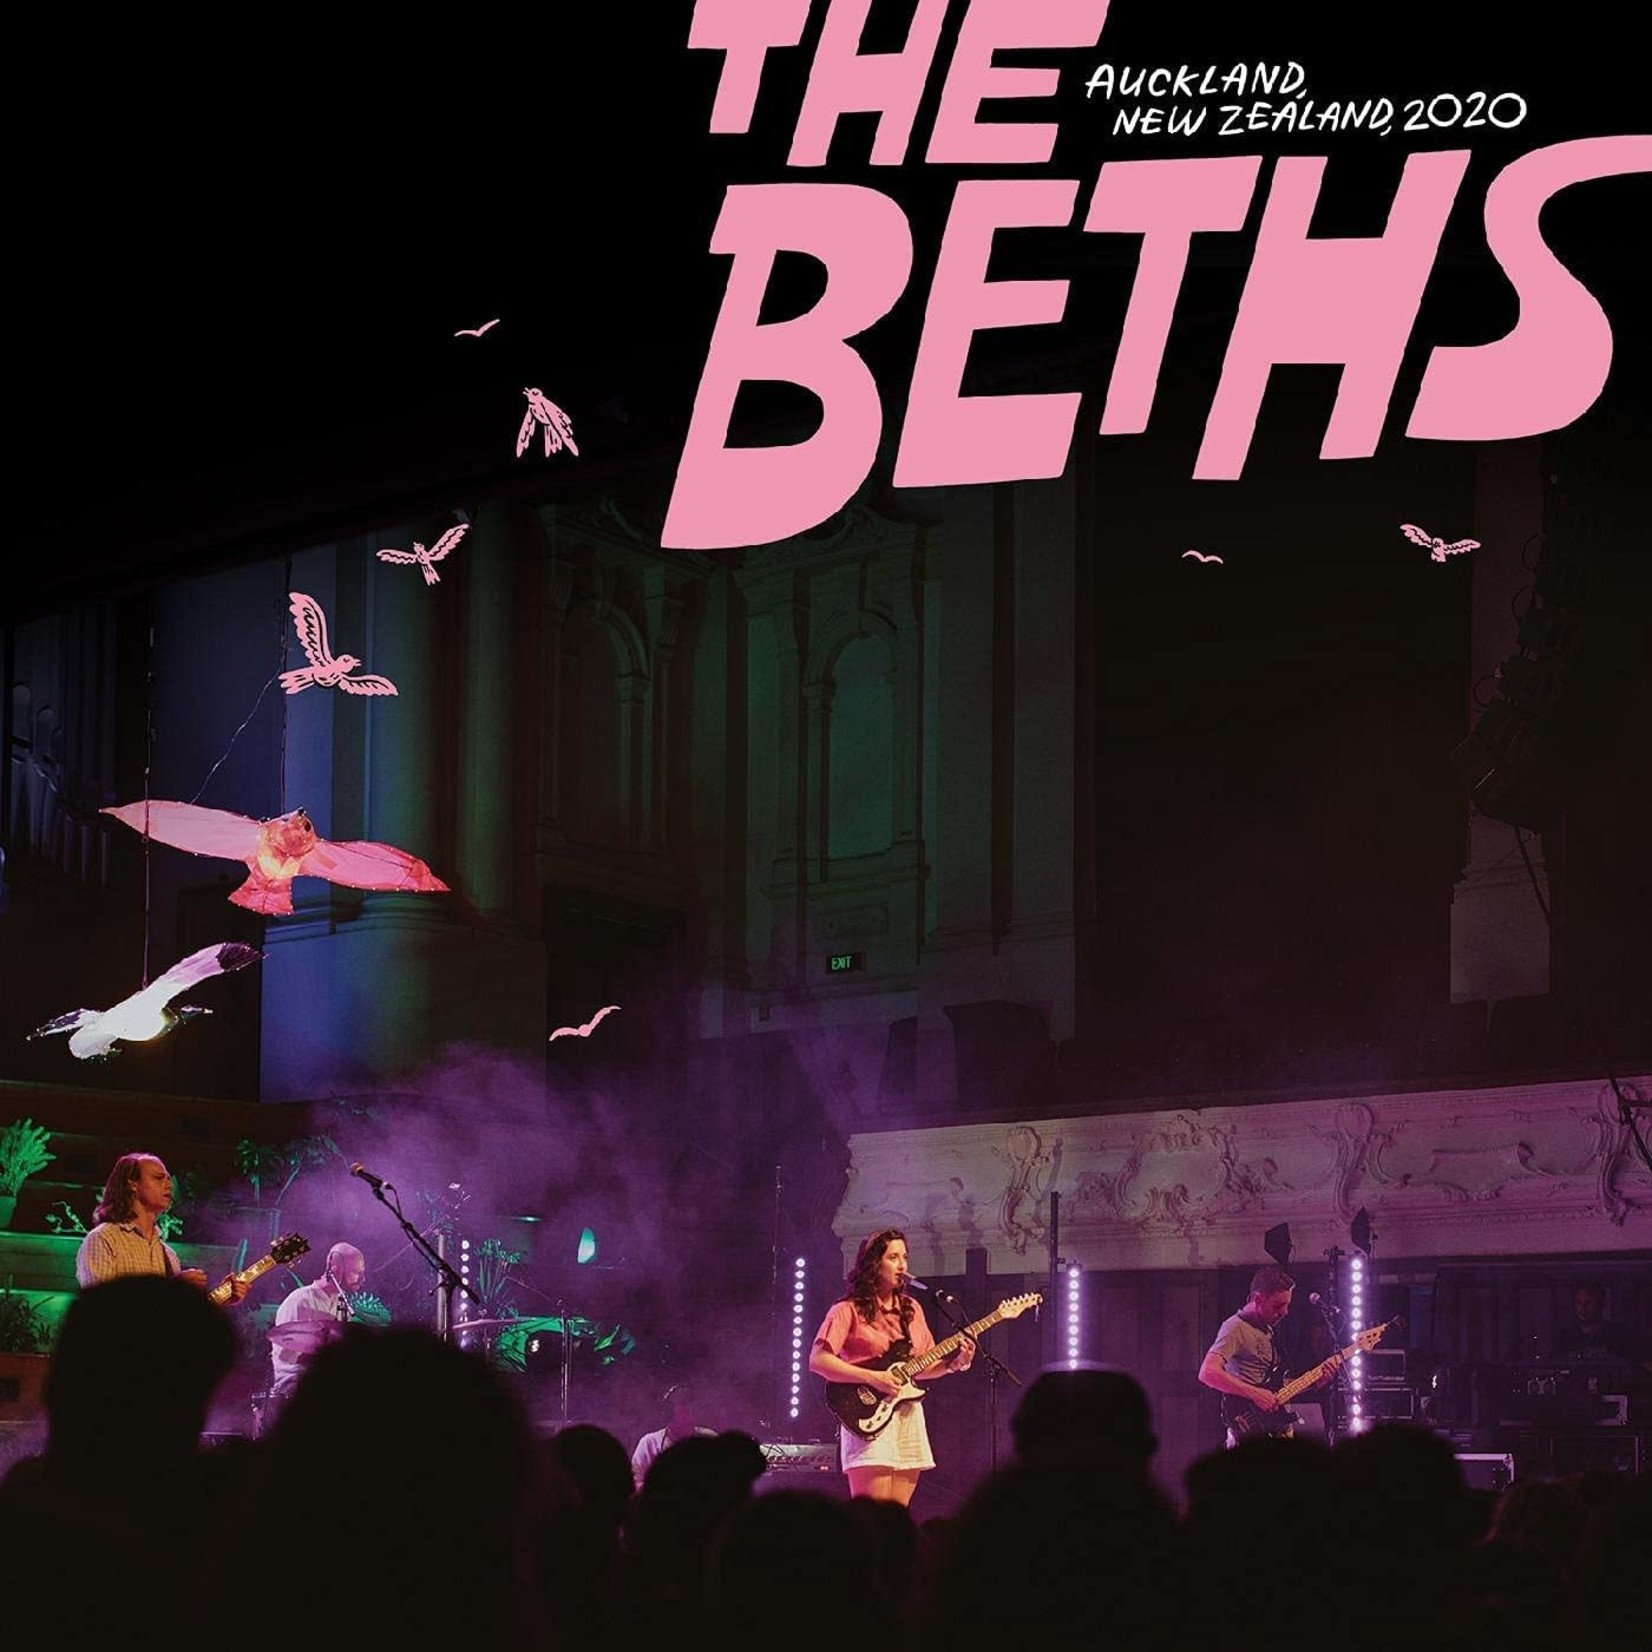 THE BETHS AUCKLAND, NEW ZEALAND, 2020  2LP